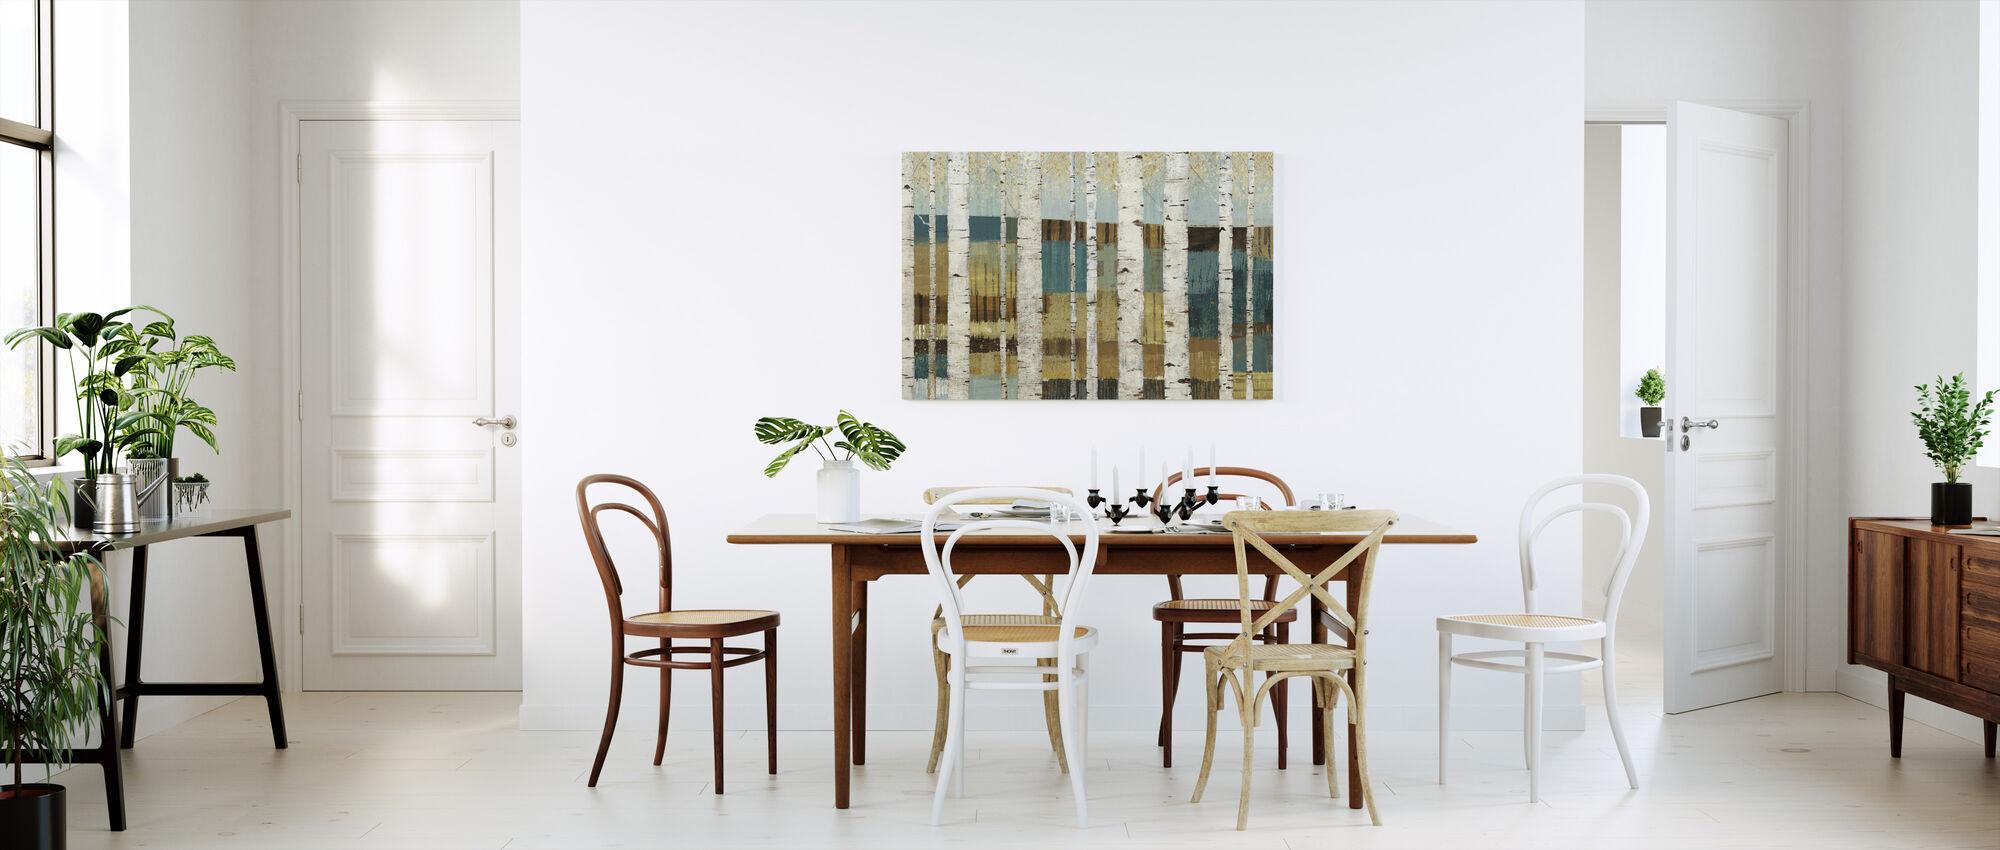 Shimmering Valley - Canvas print - Kitchen